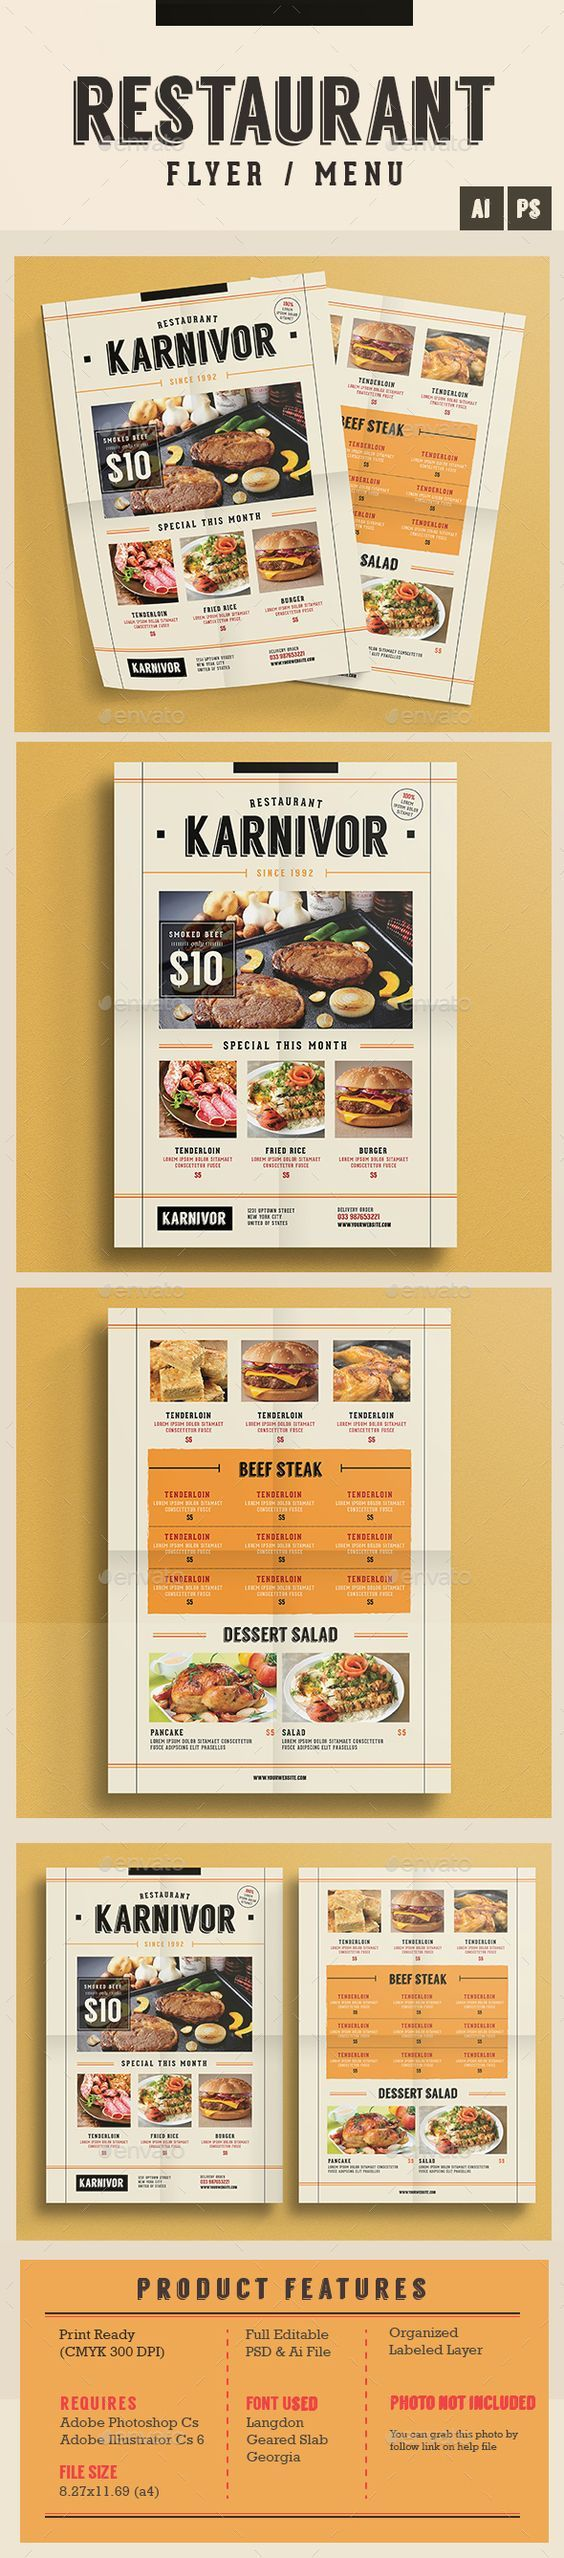 Restaurant Flyer Food Menu Template PSD, Vector AI #design Download: http://graphicriver.net/item/restaurant-flyer-menu/14021906?ref=ksioks